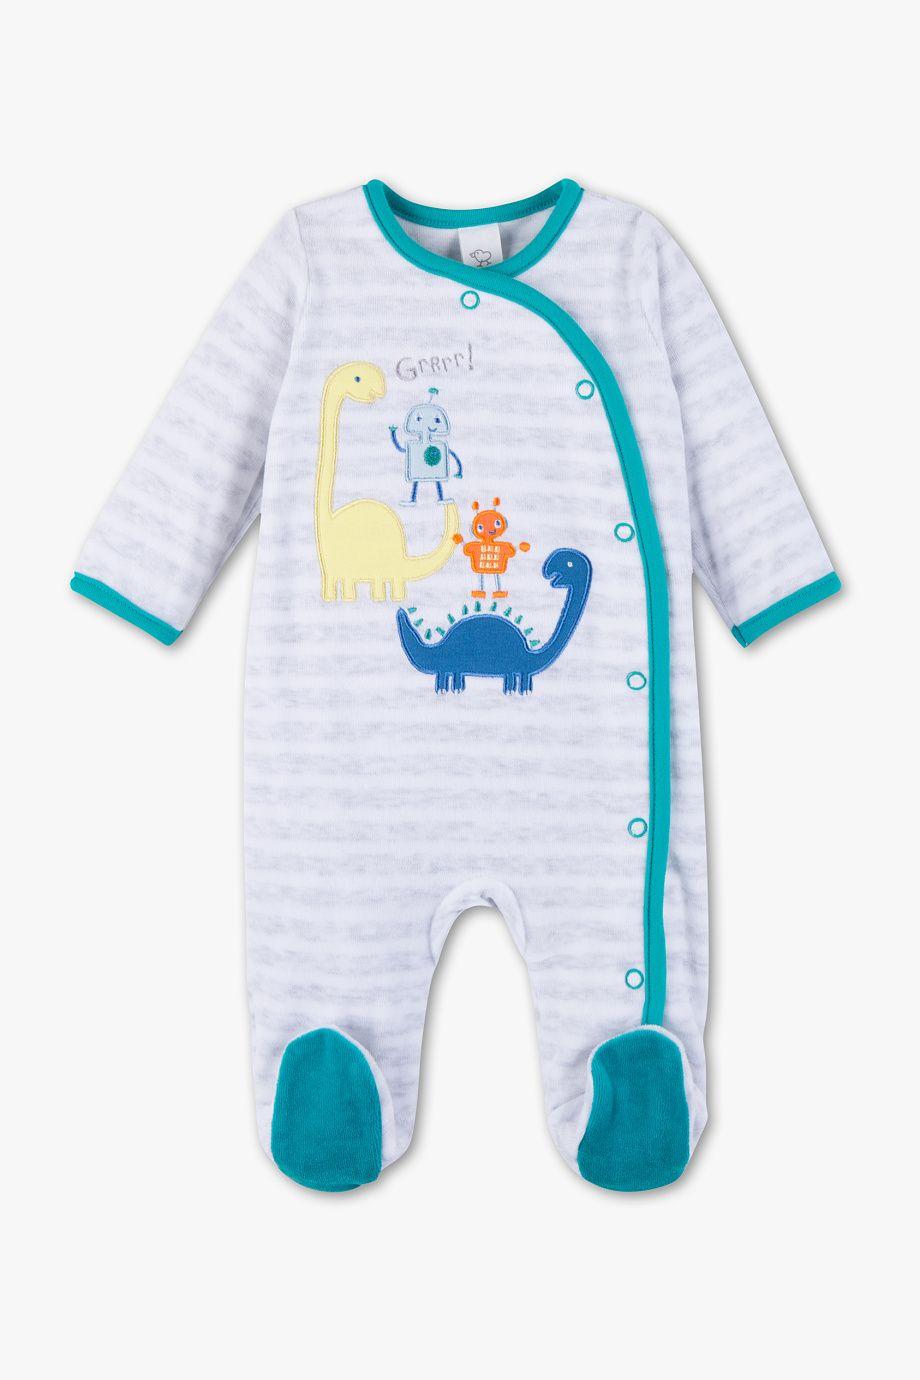 903253aa4eb70 Baby Club Pyjama pour bébé - à rayures | baby dino!! | Pyjama bébé ...